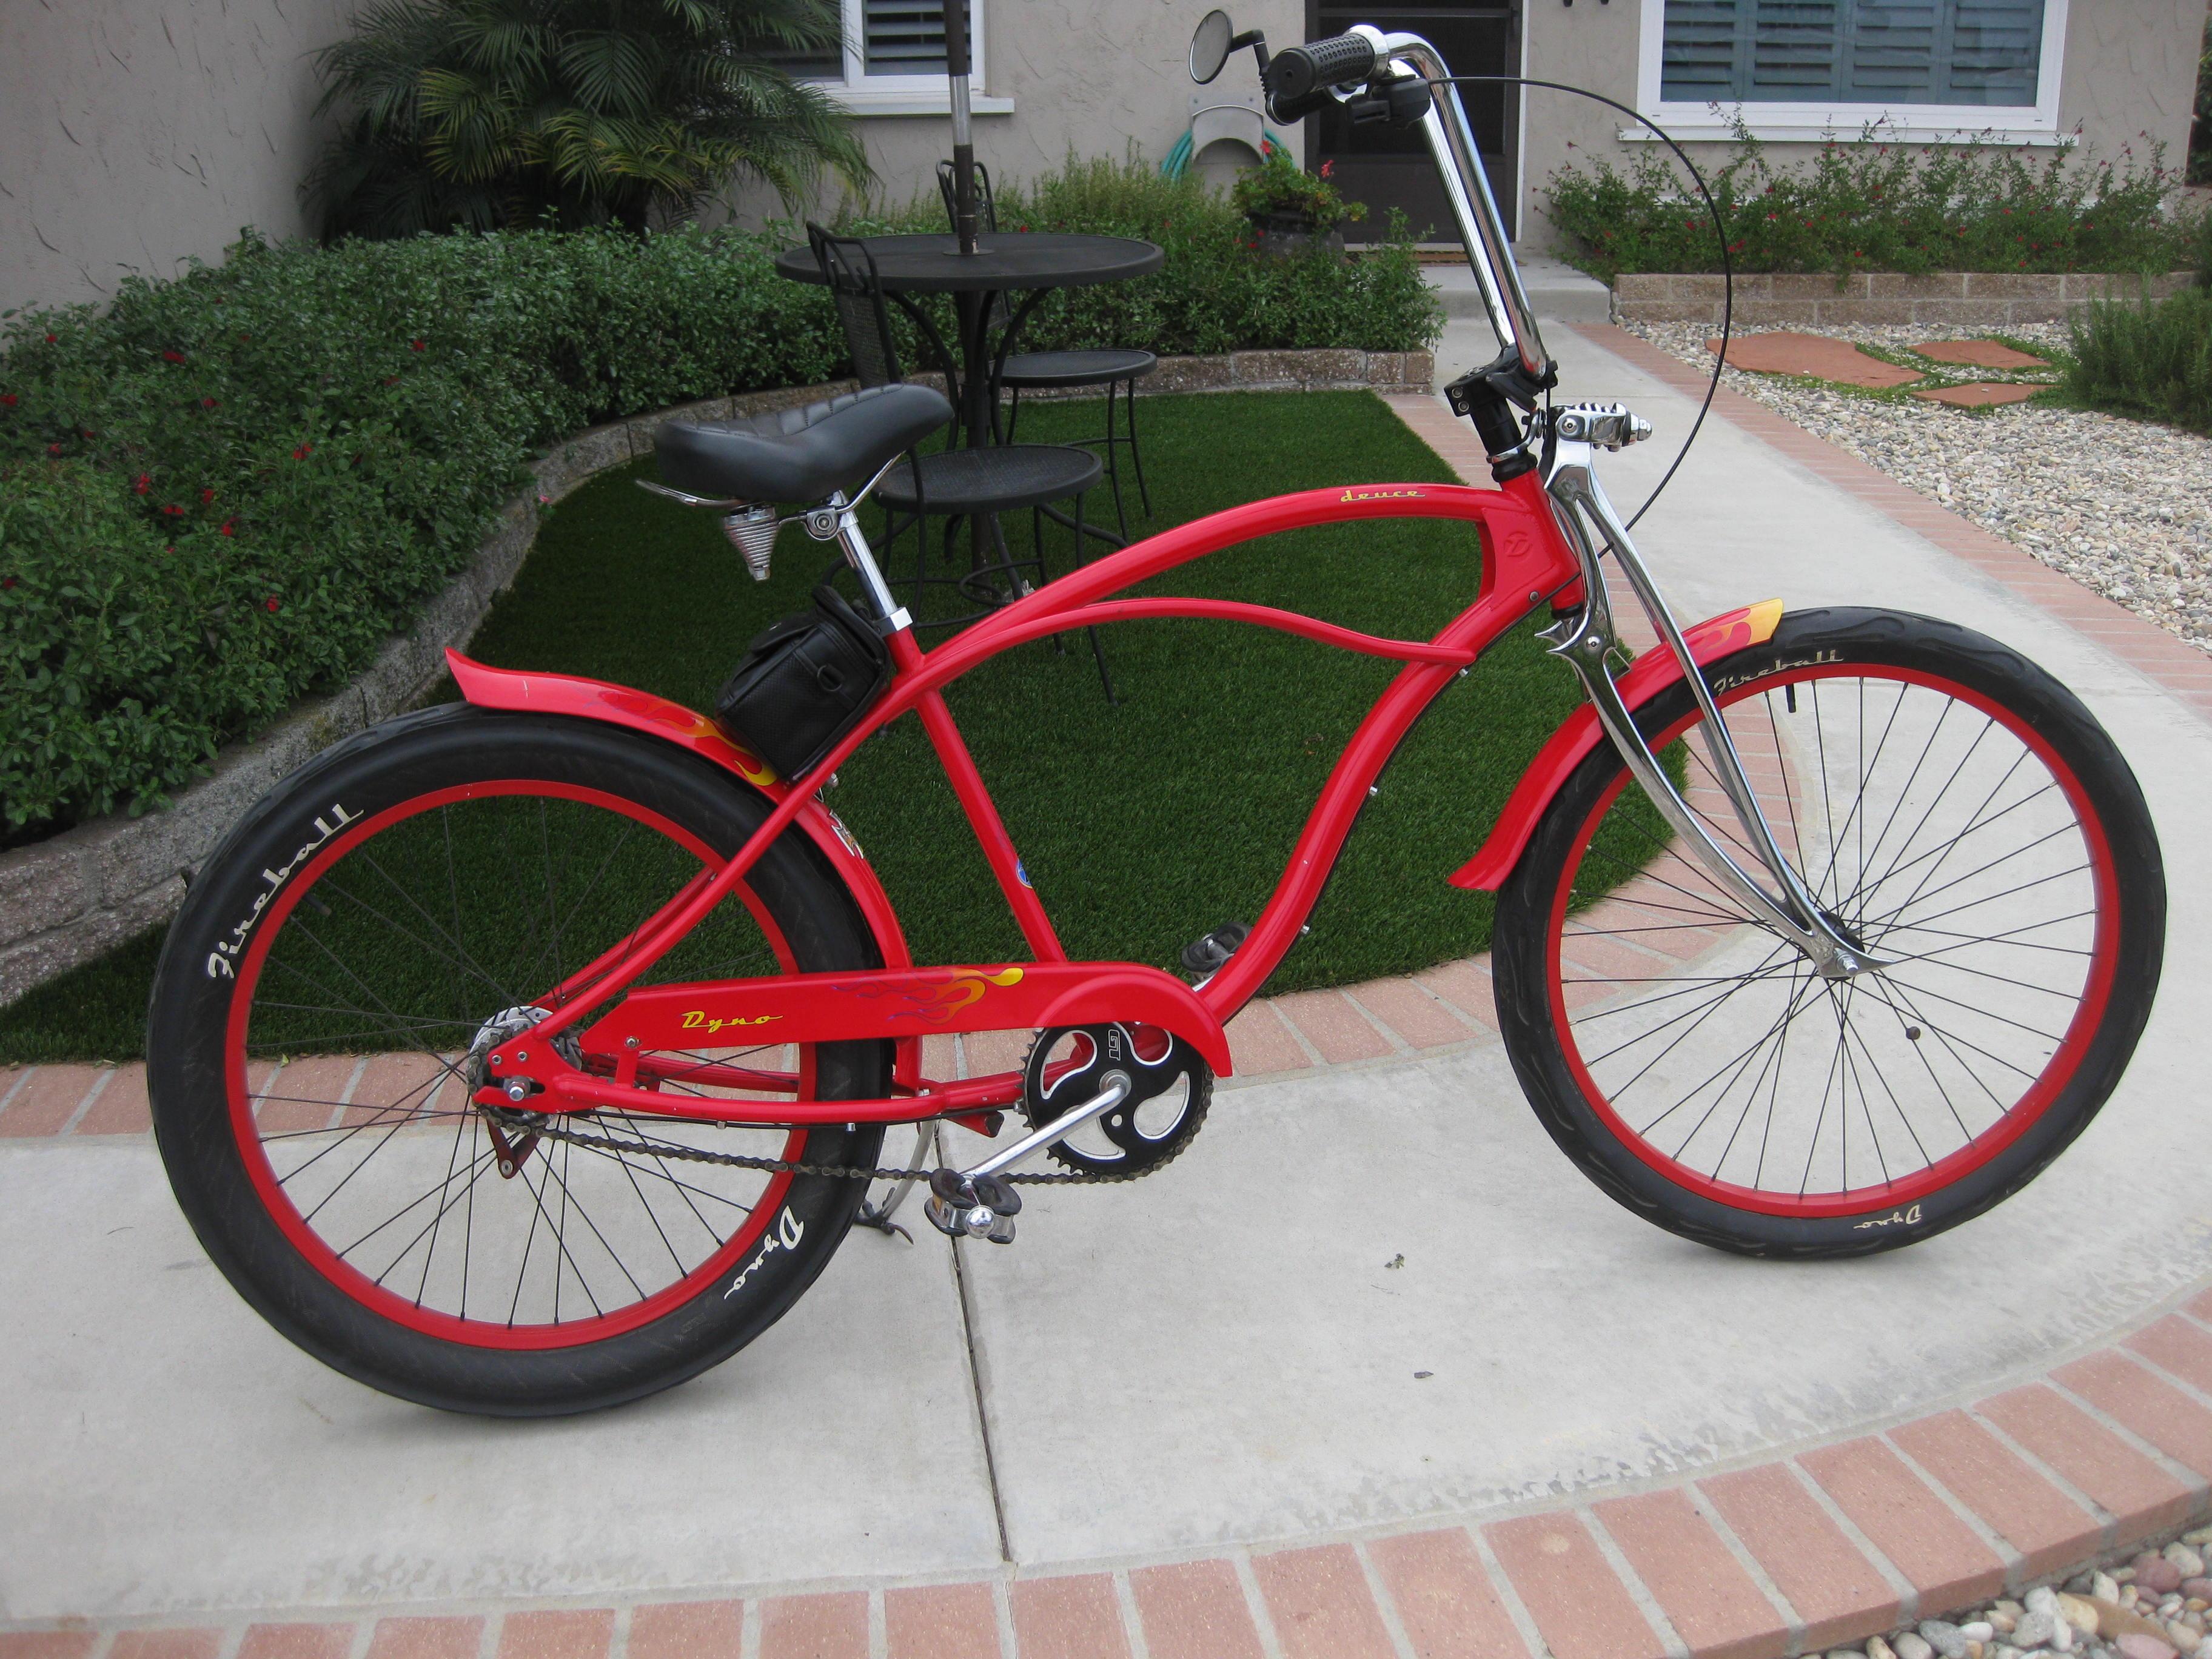 Bikes Gt Dyno Deuce Dyno Deuce with custom forks